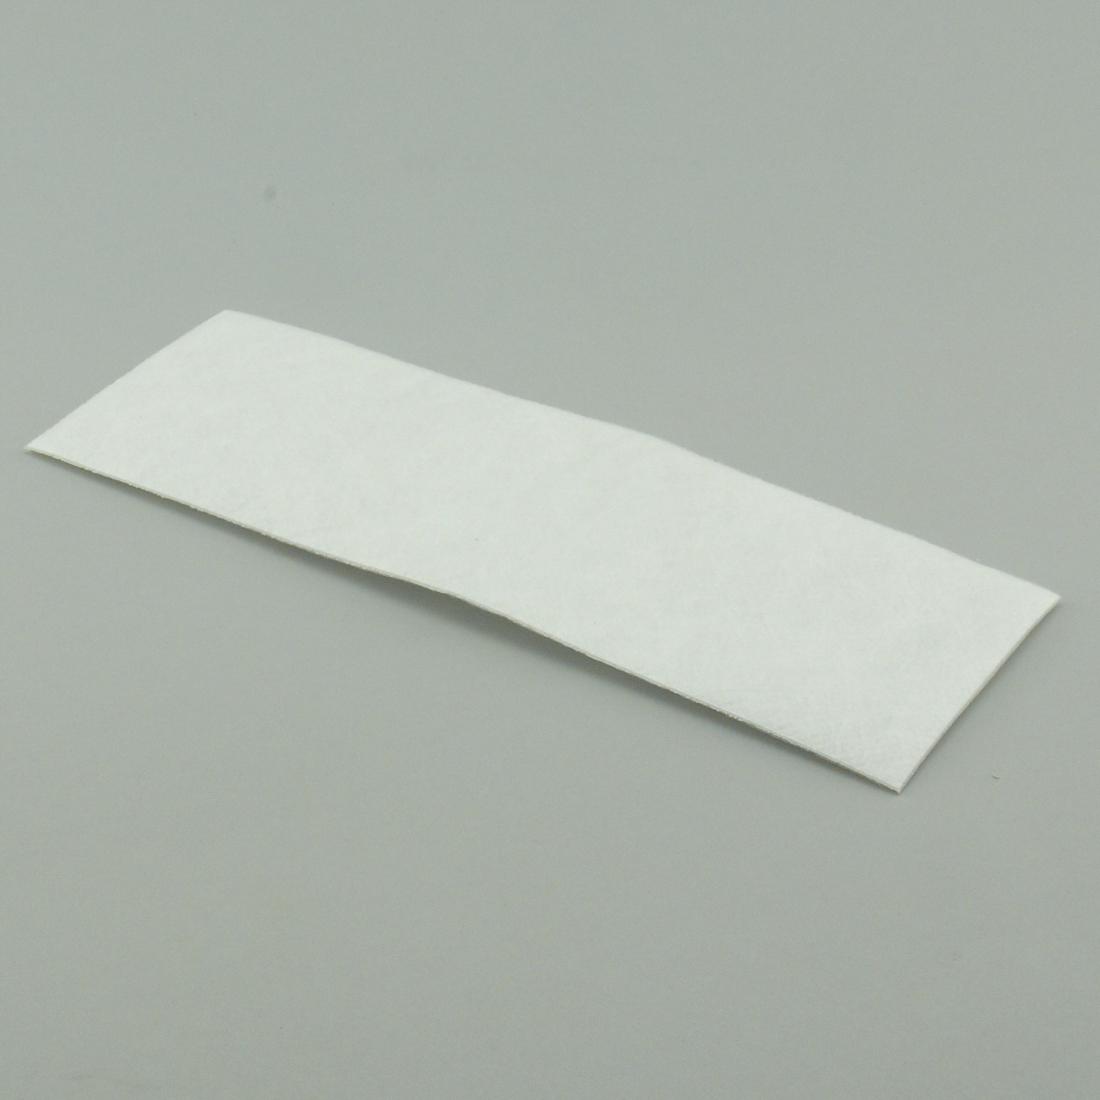 Simplicity Wonder Hepa & Charcoal Filter Set